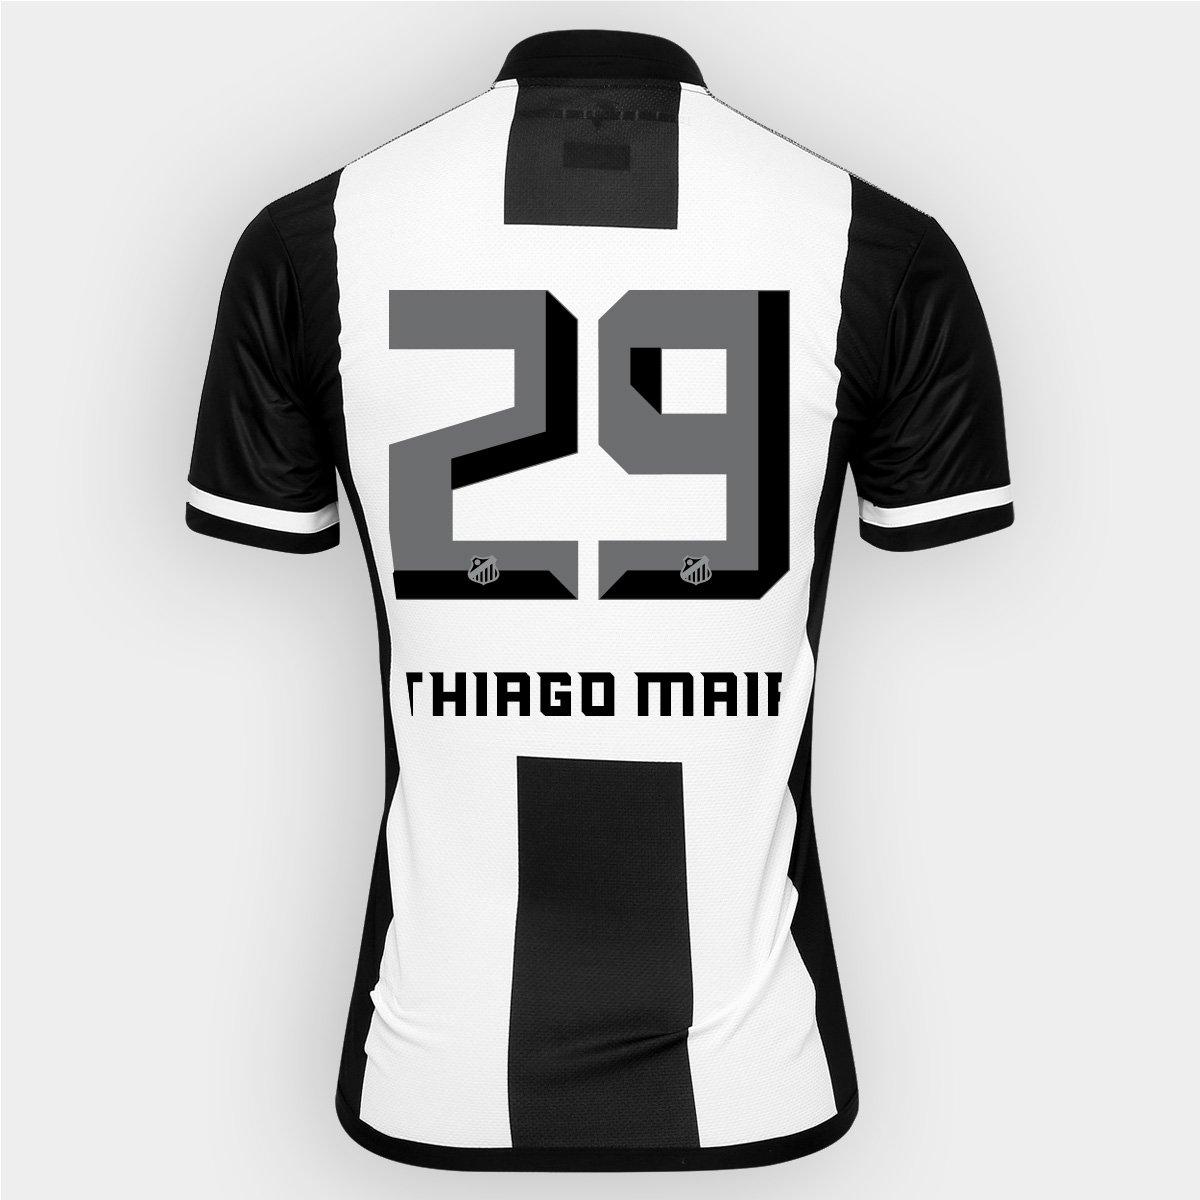 5592fa3123787 Camisa Kappa Santos II 2016 nº 29 - Thiago Maia - Compre Agora ...